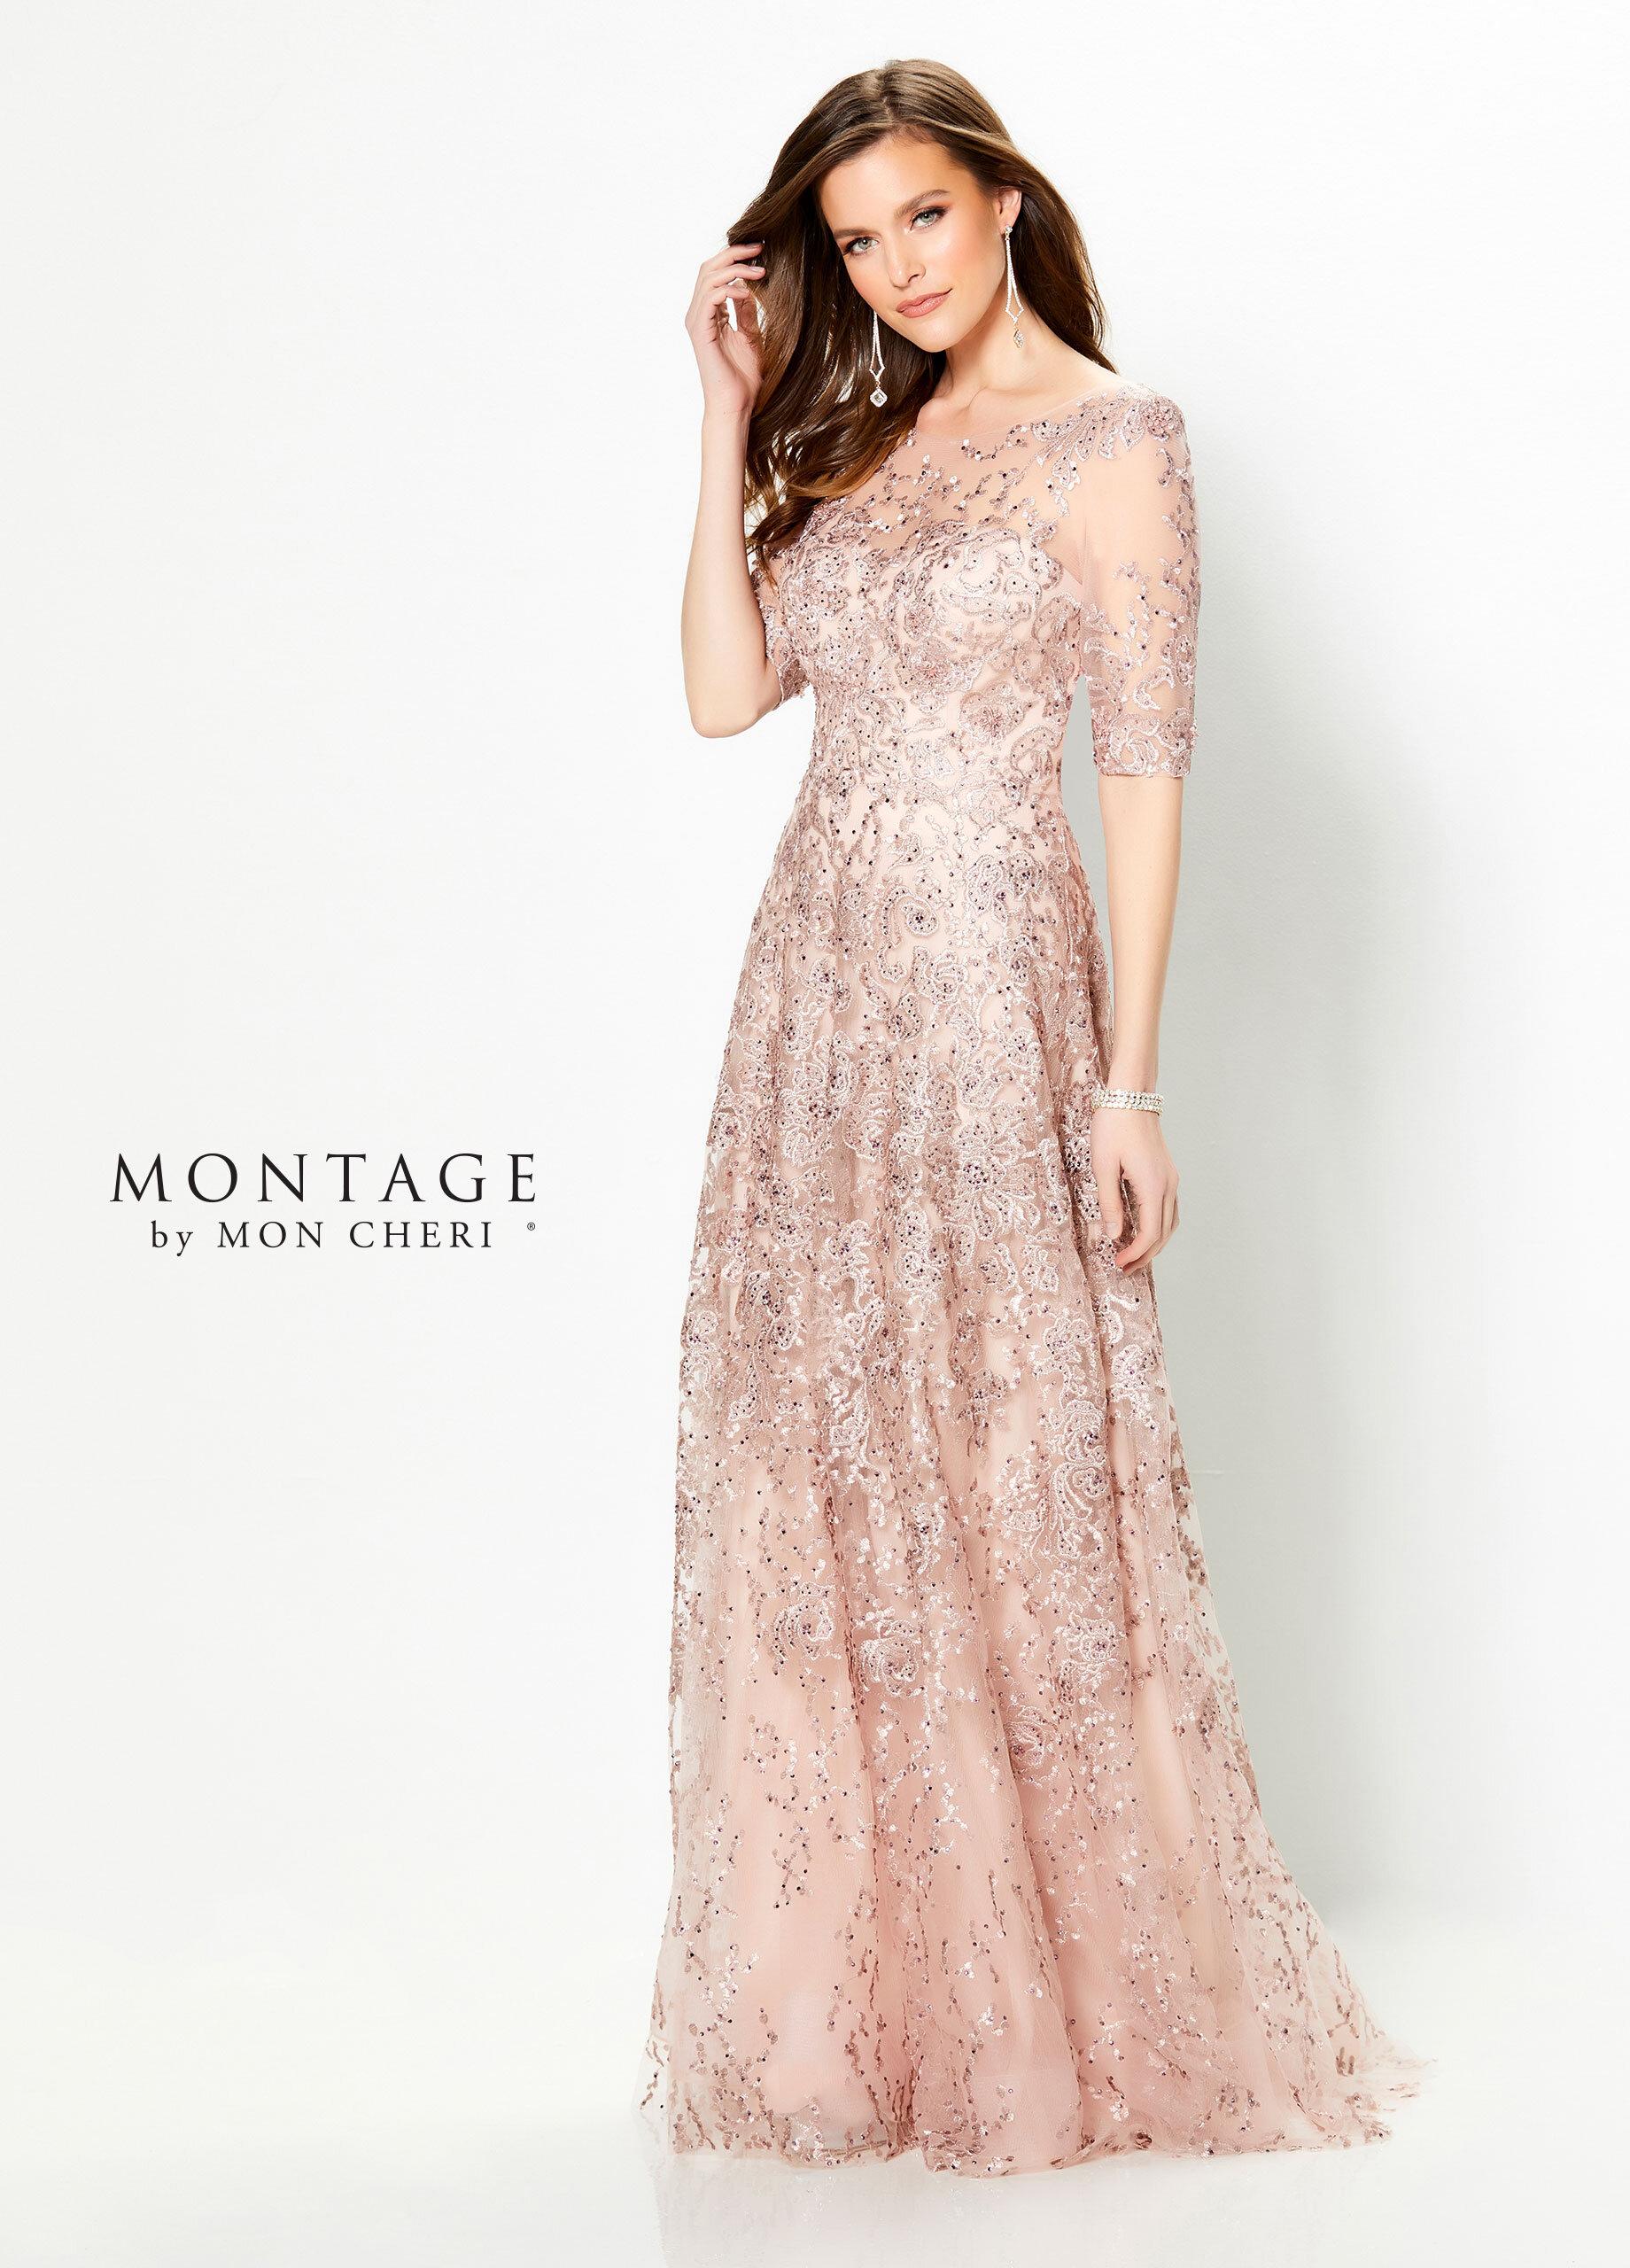 Montage, $550-$700